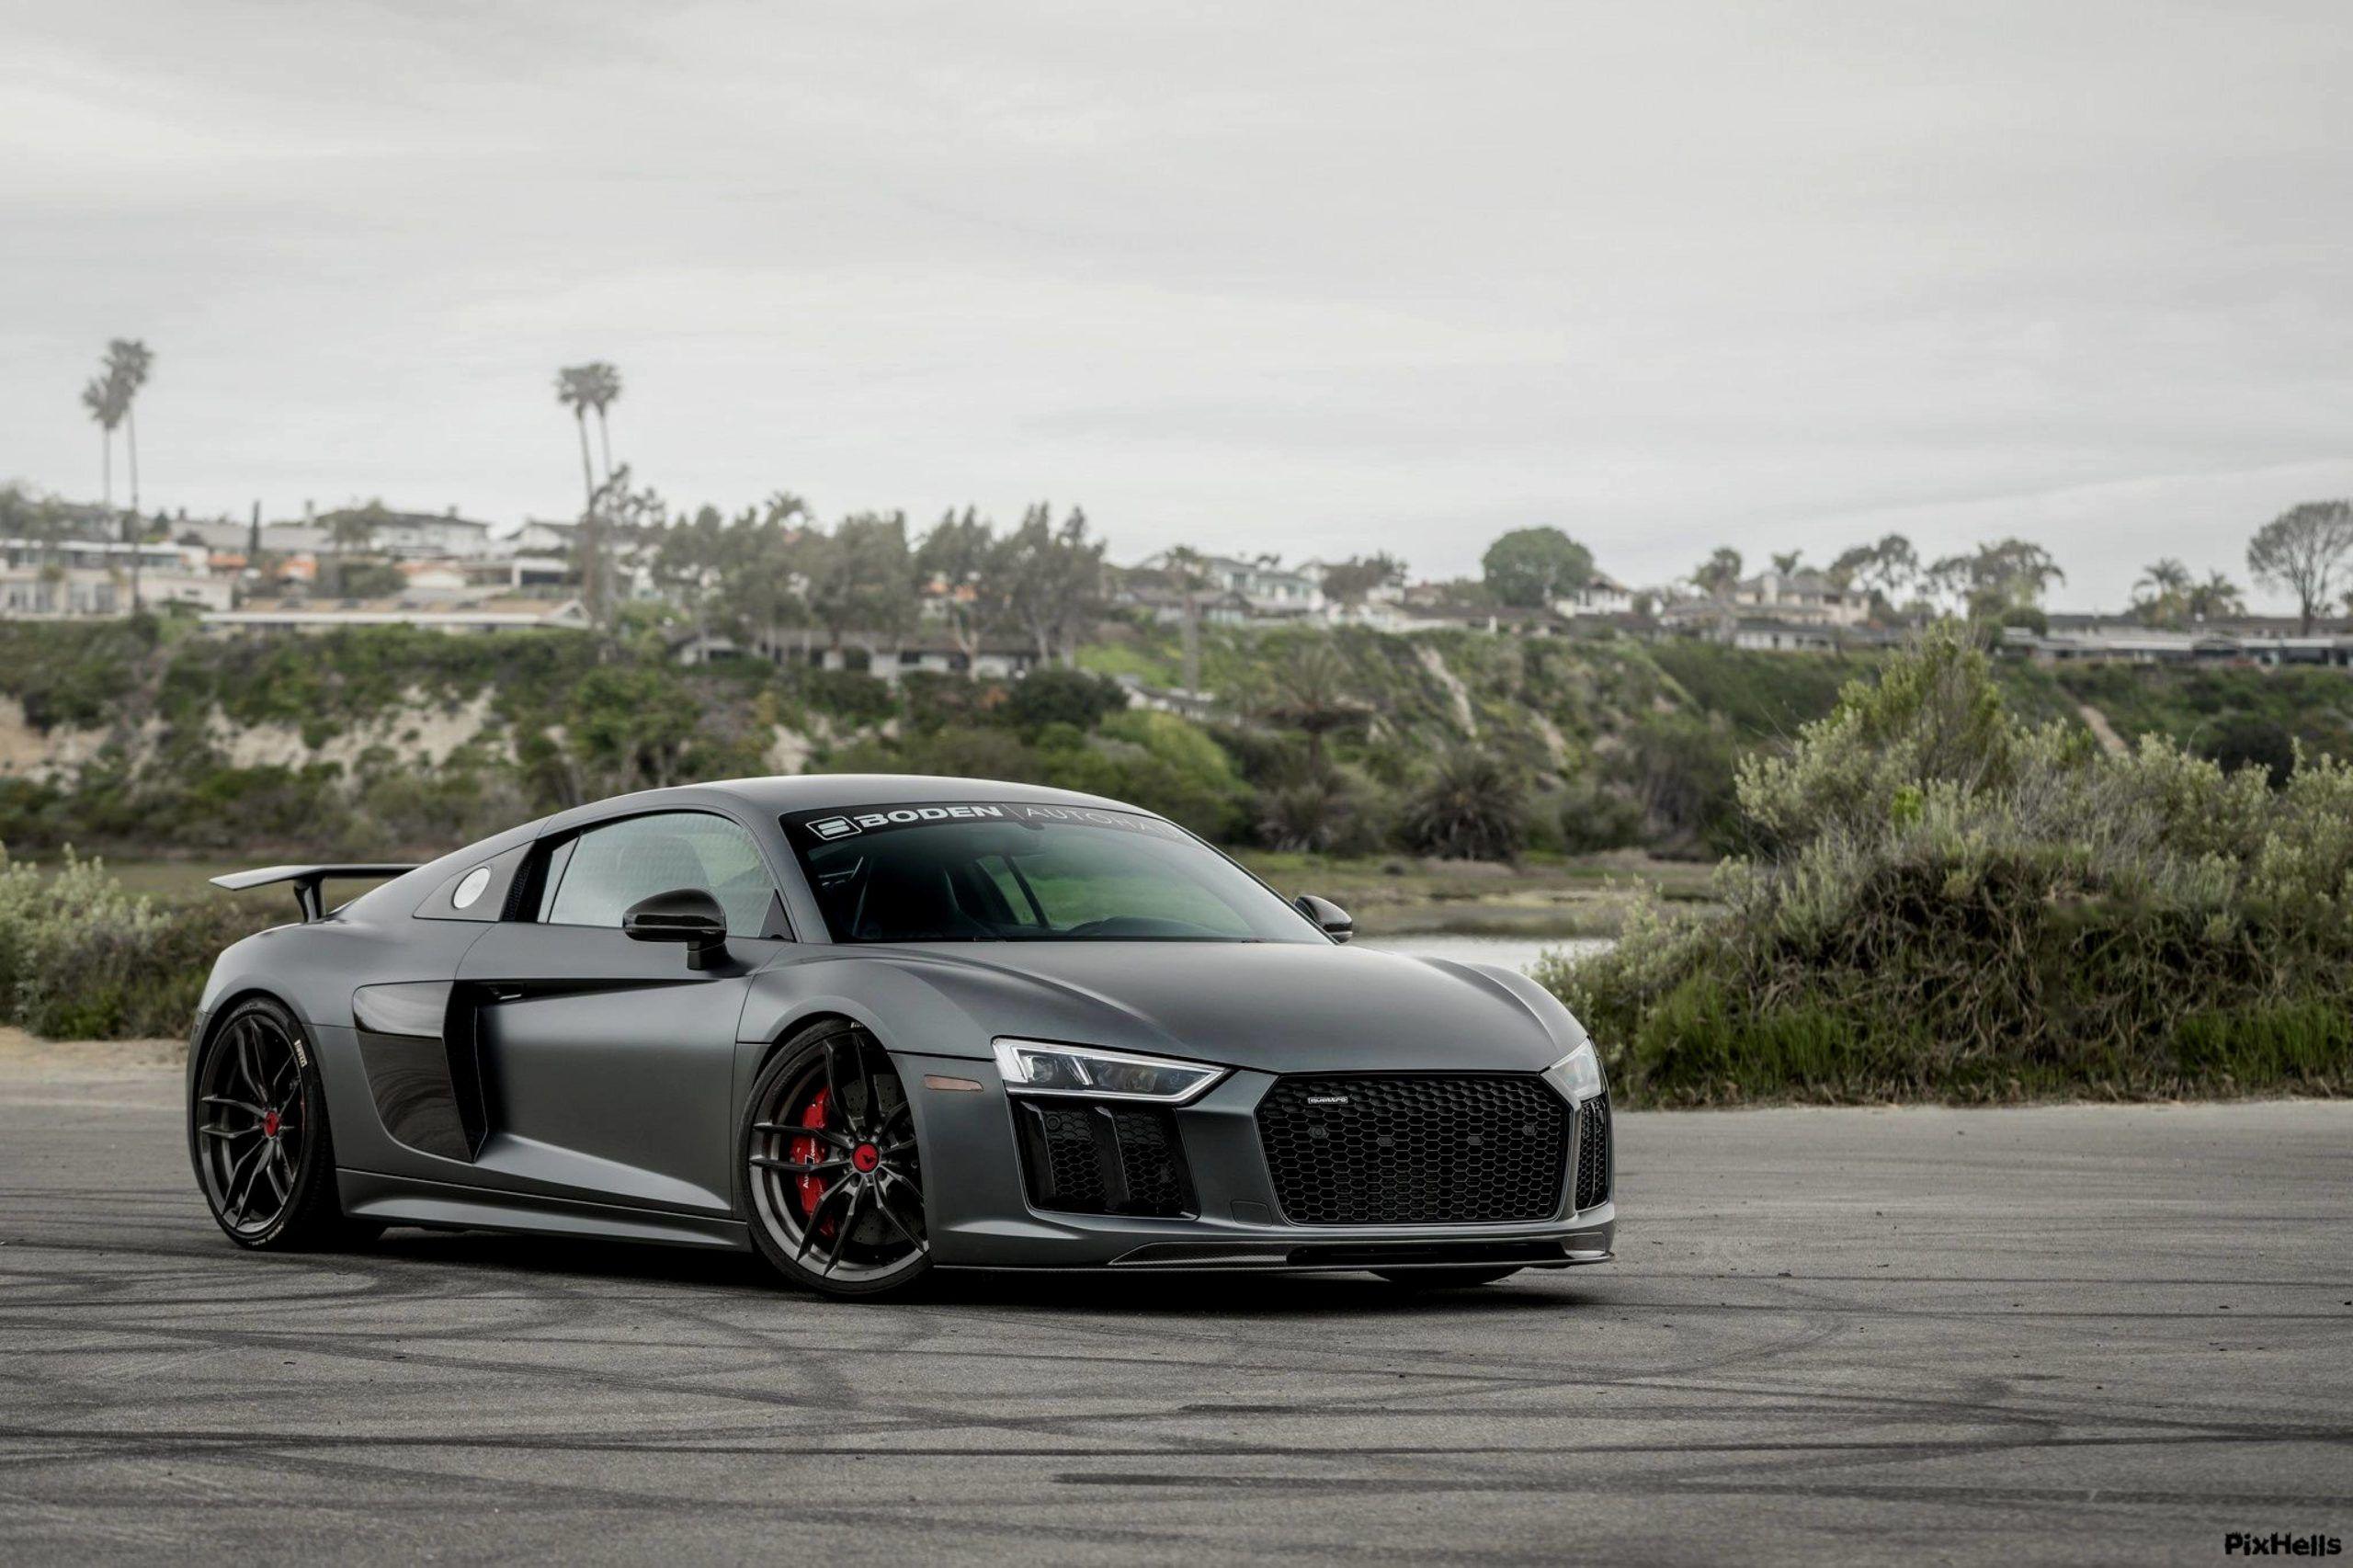 Audi R8 Wallpapers 163434 2020 Audi Spor Arabalar Araba